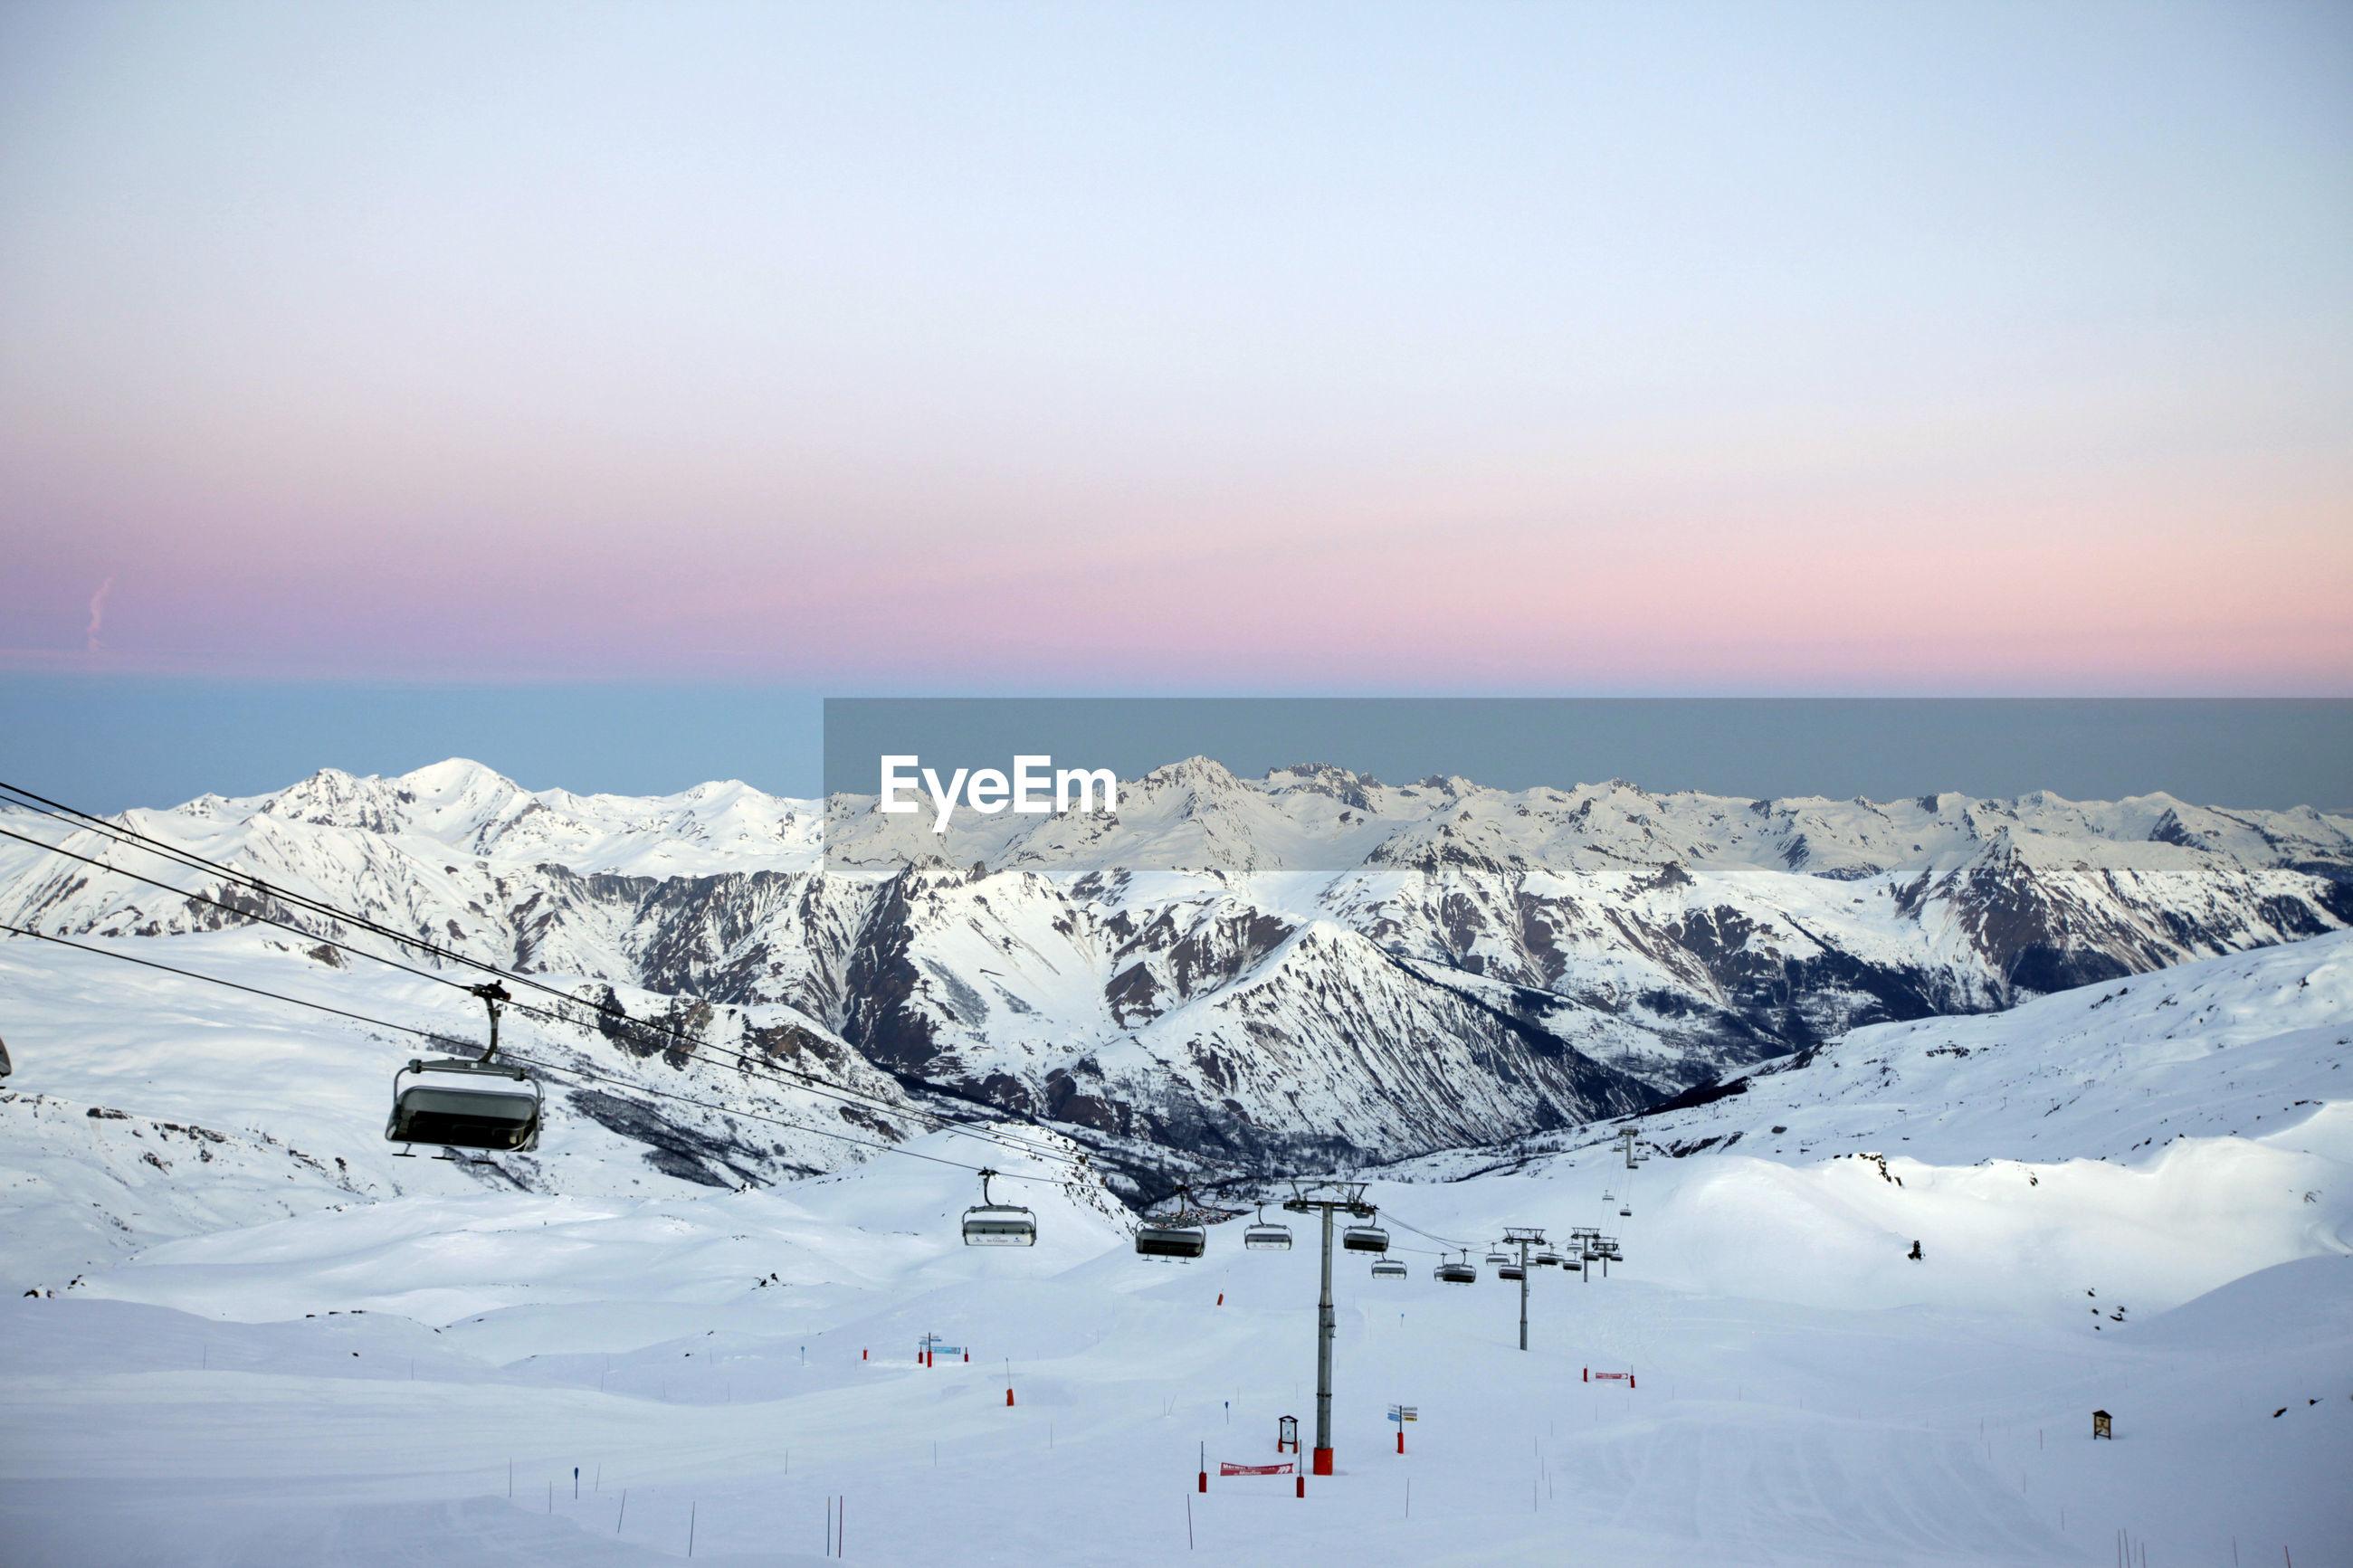 Ski lift on snow covered landscape during sunset